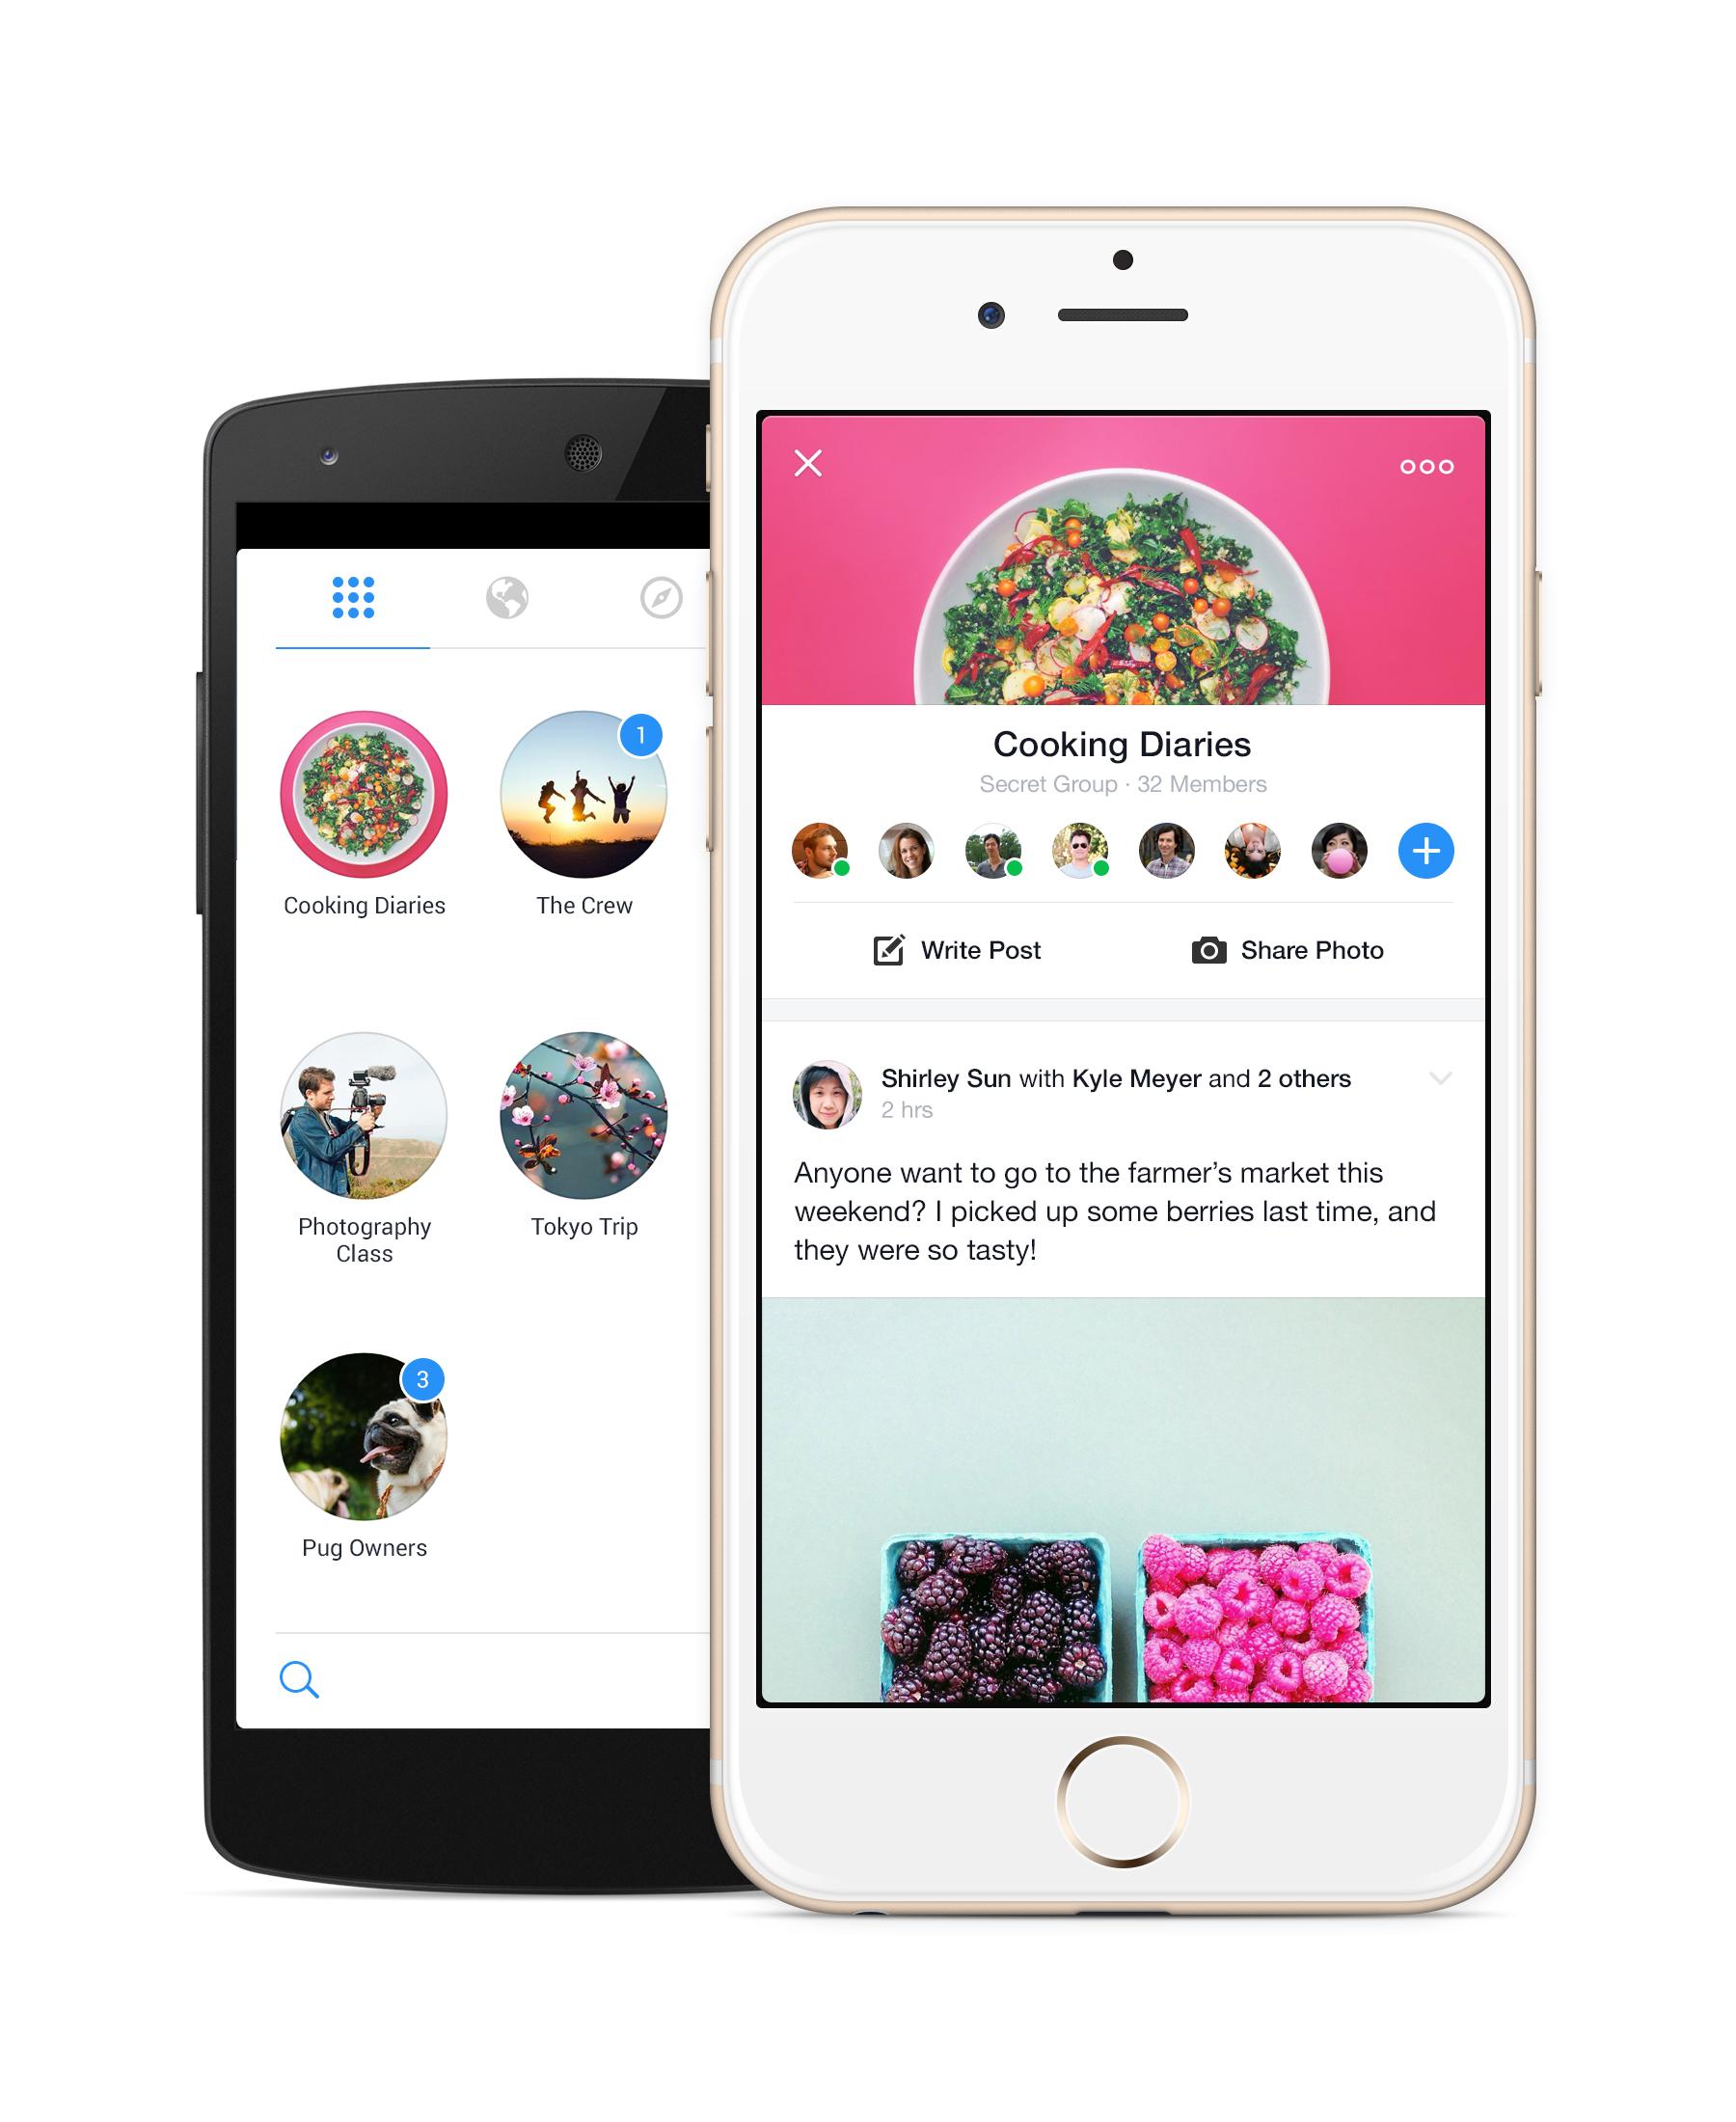 Gruppen-App herunterladen